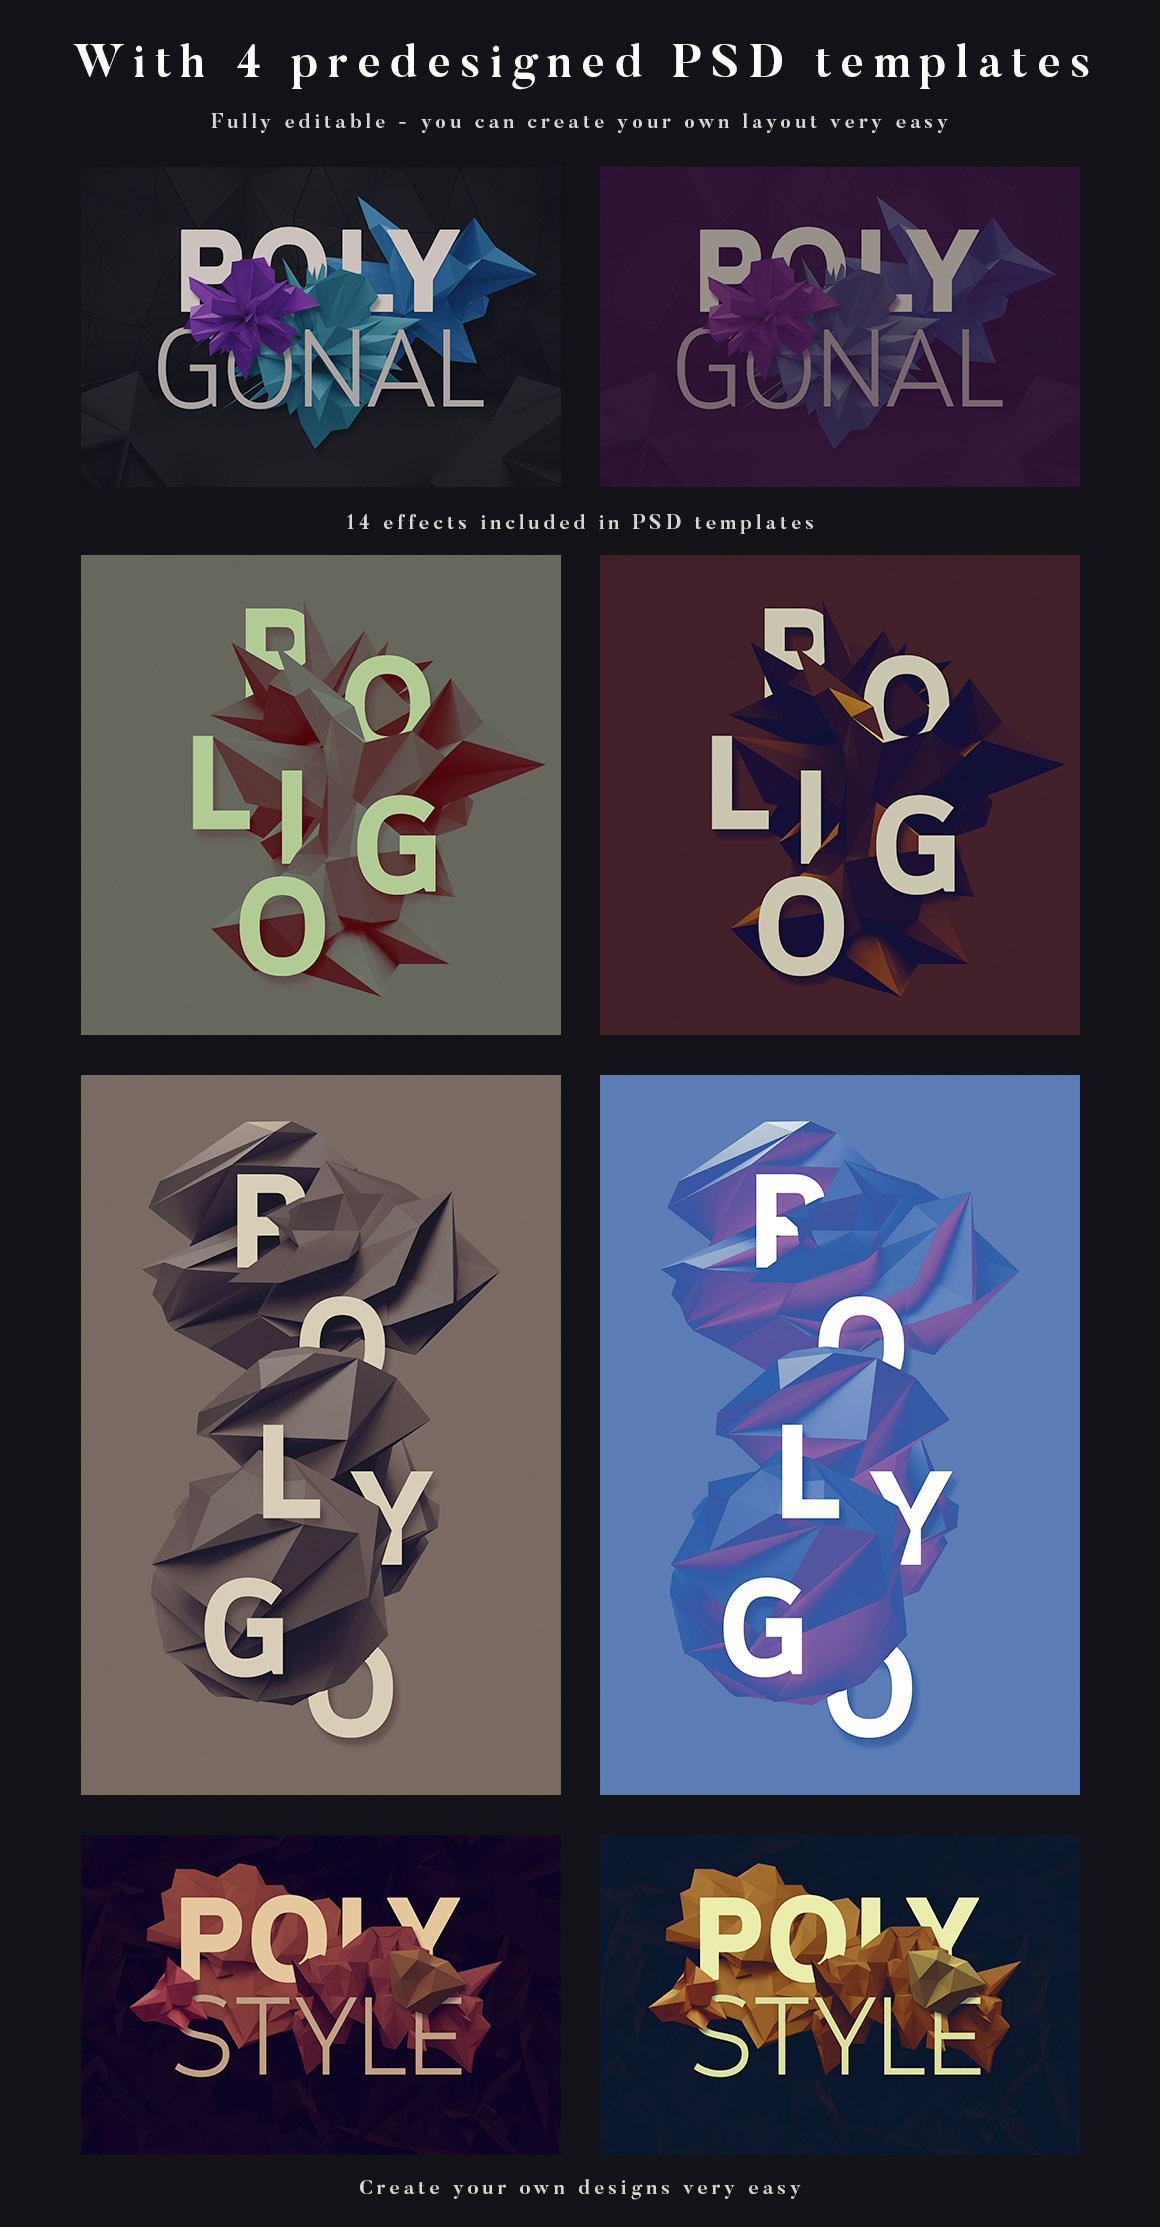 PolygonalToolkit03